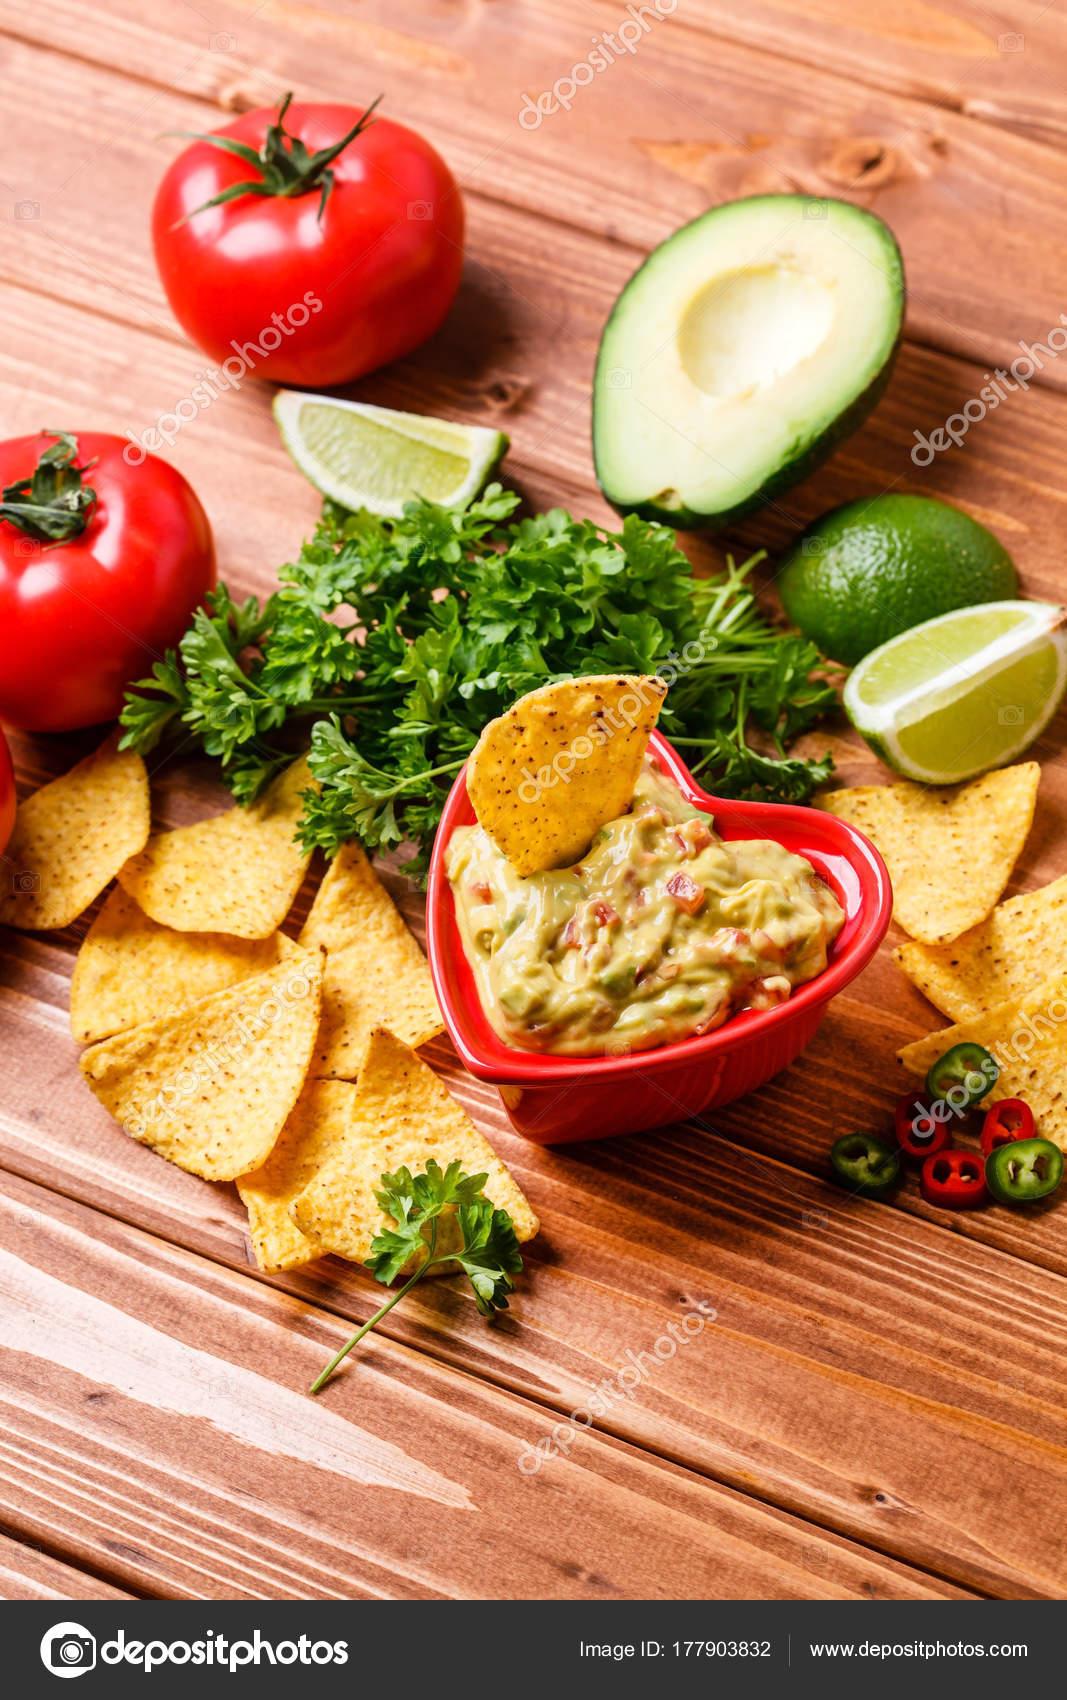 Guacamole Mit Avocado Limette Tomaten Und Koriander Stockfoto